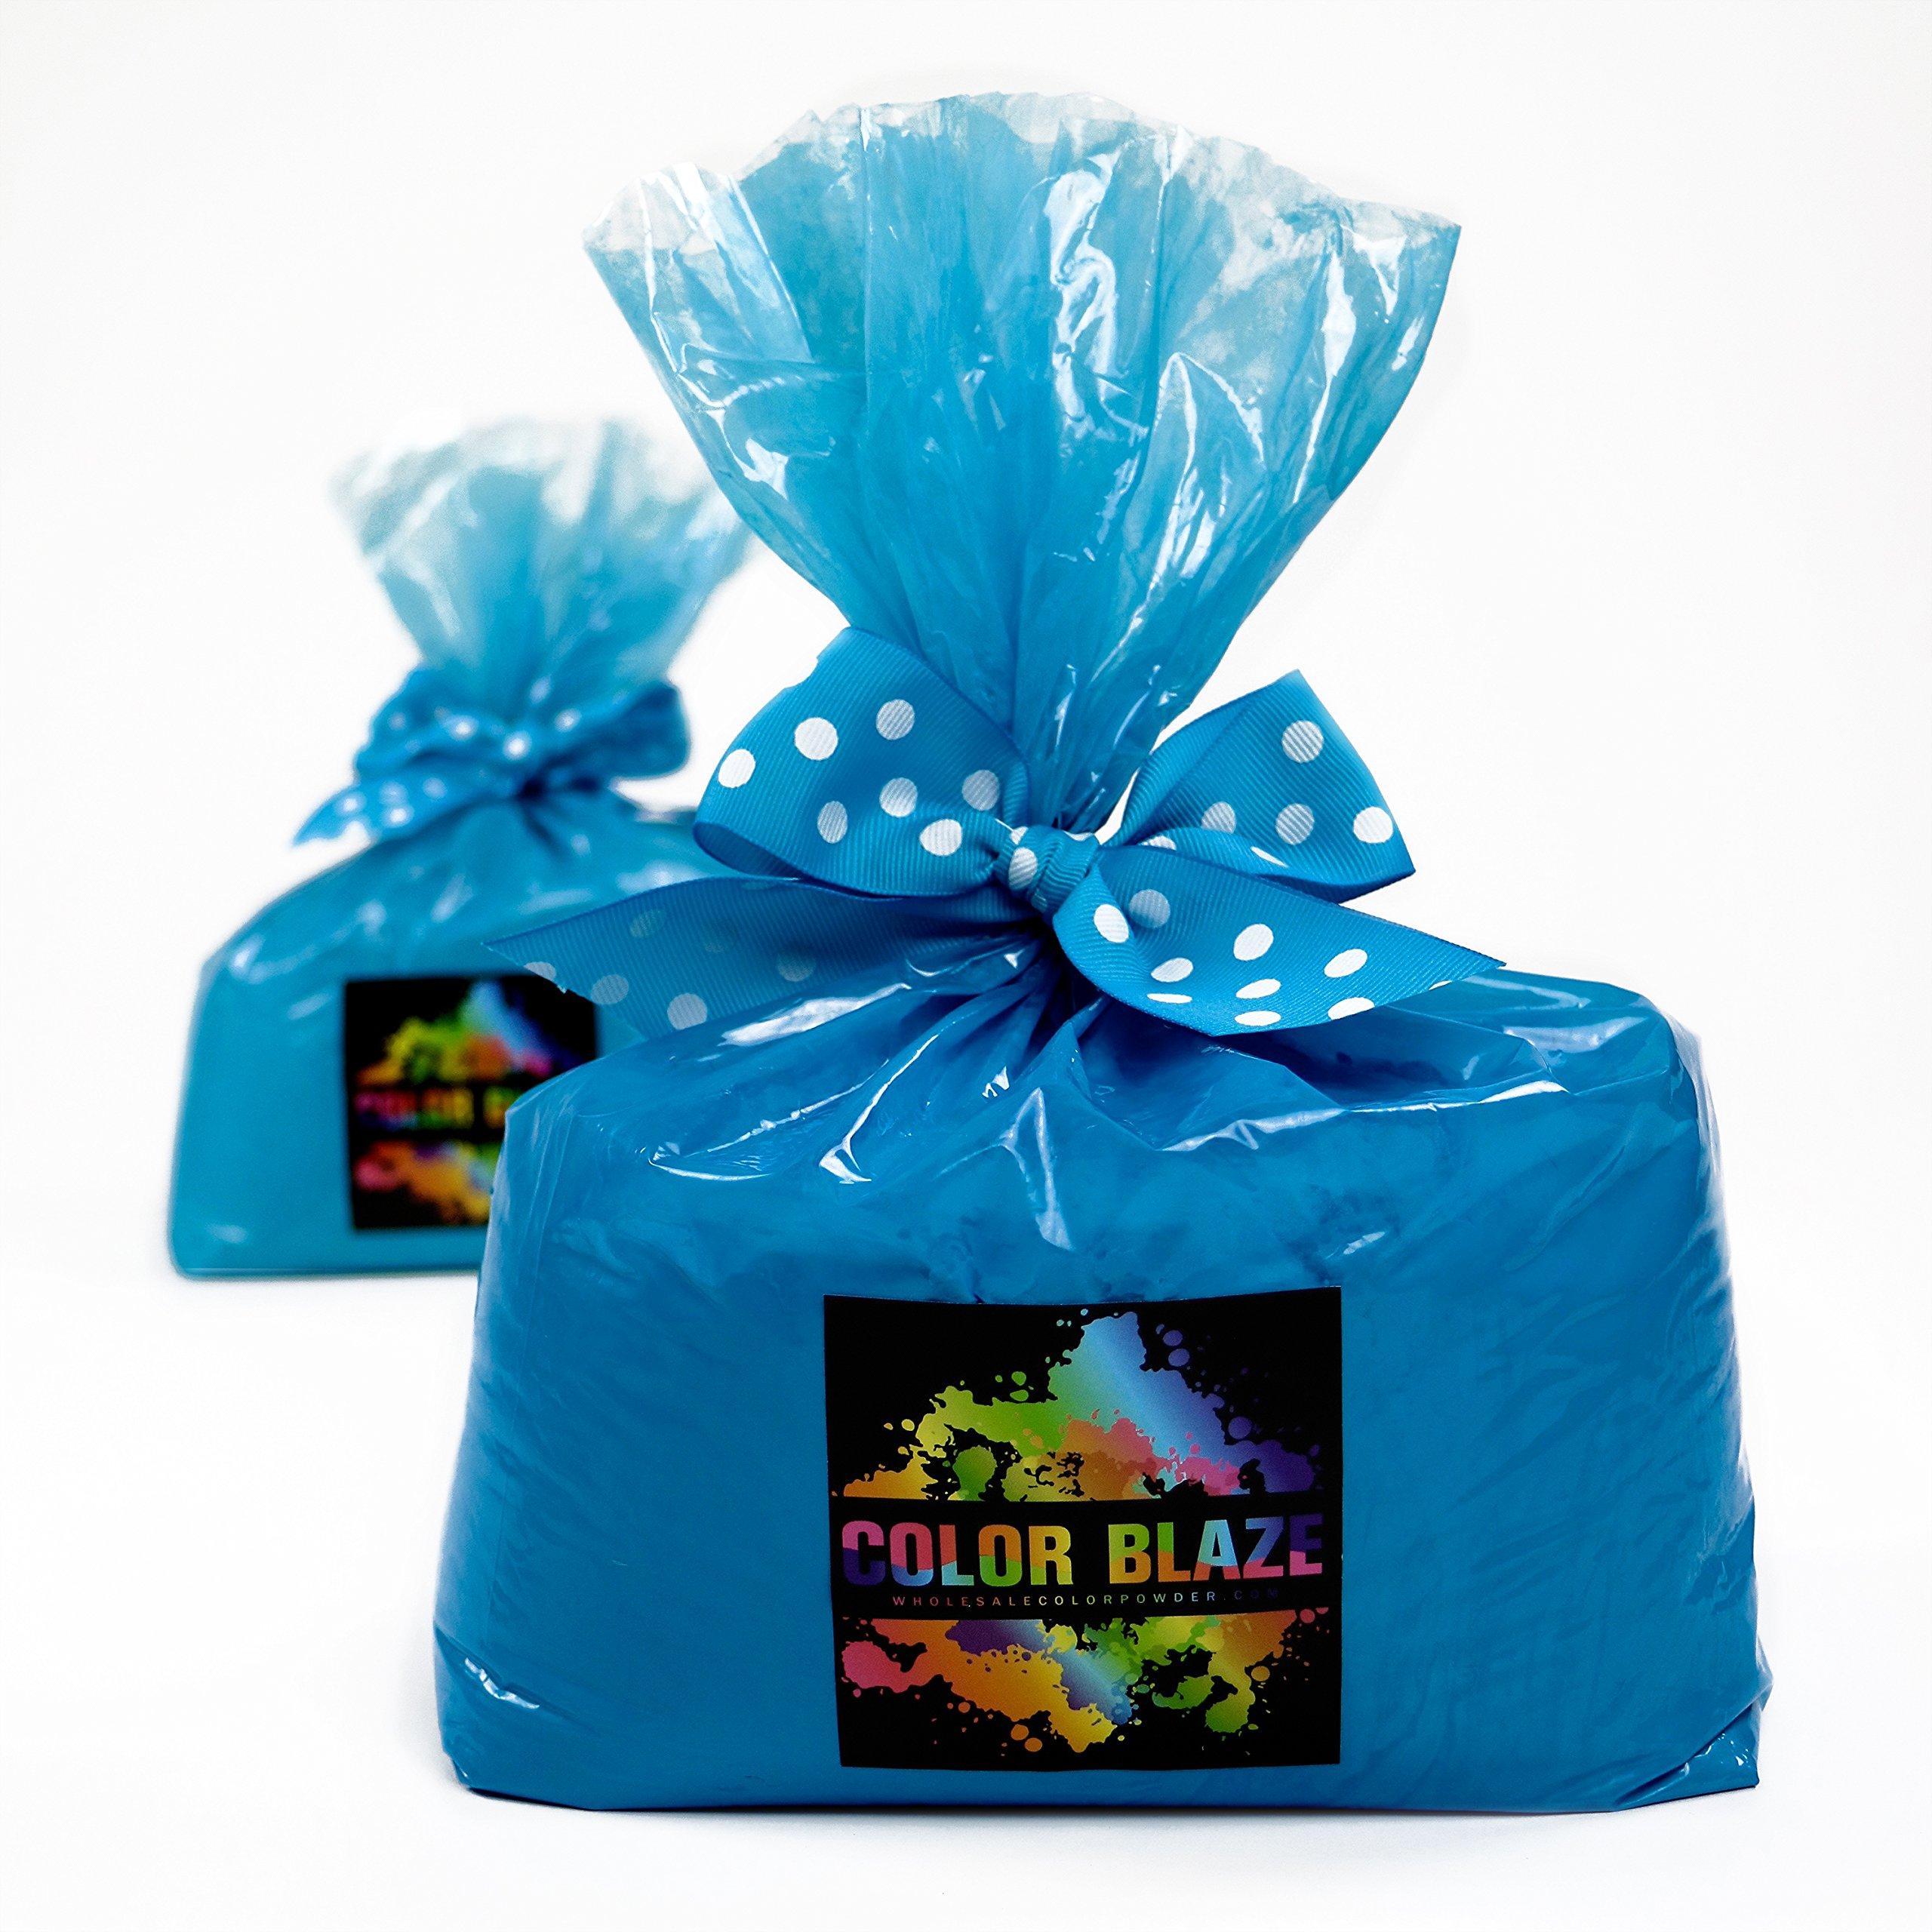 Gender Reveal Blue Color Powder 10 Pounds by Color Blaze Supply/Wholesale Color Powder